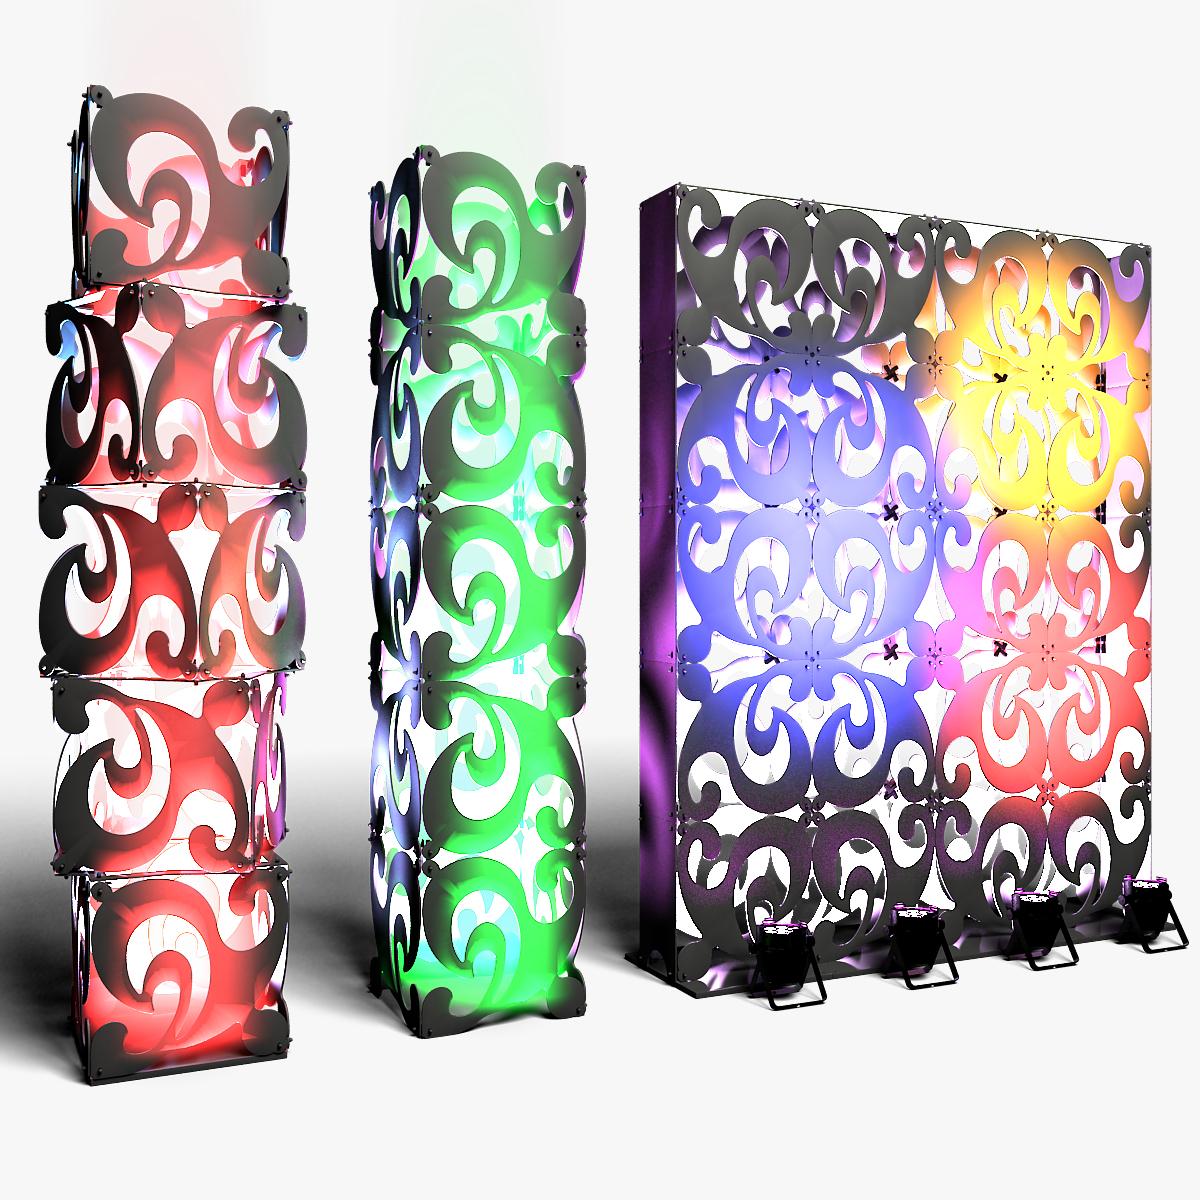 70-08-01-1200x1200.jpg Download STL file Stage Decor Collection 01 (Modular 9 Pieces) • 3D printer model, akerStudio